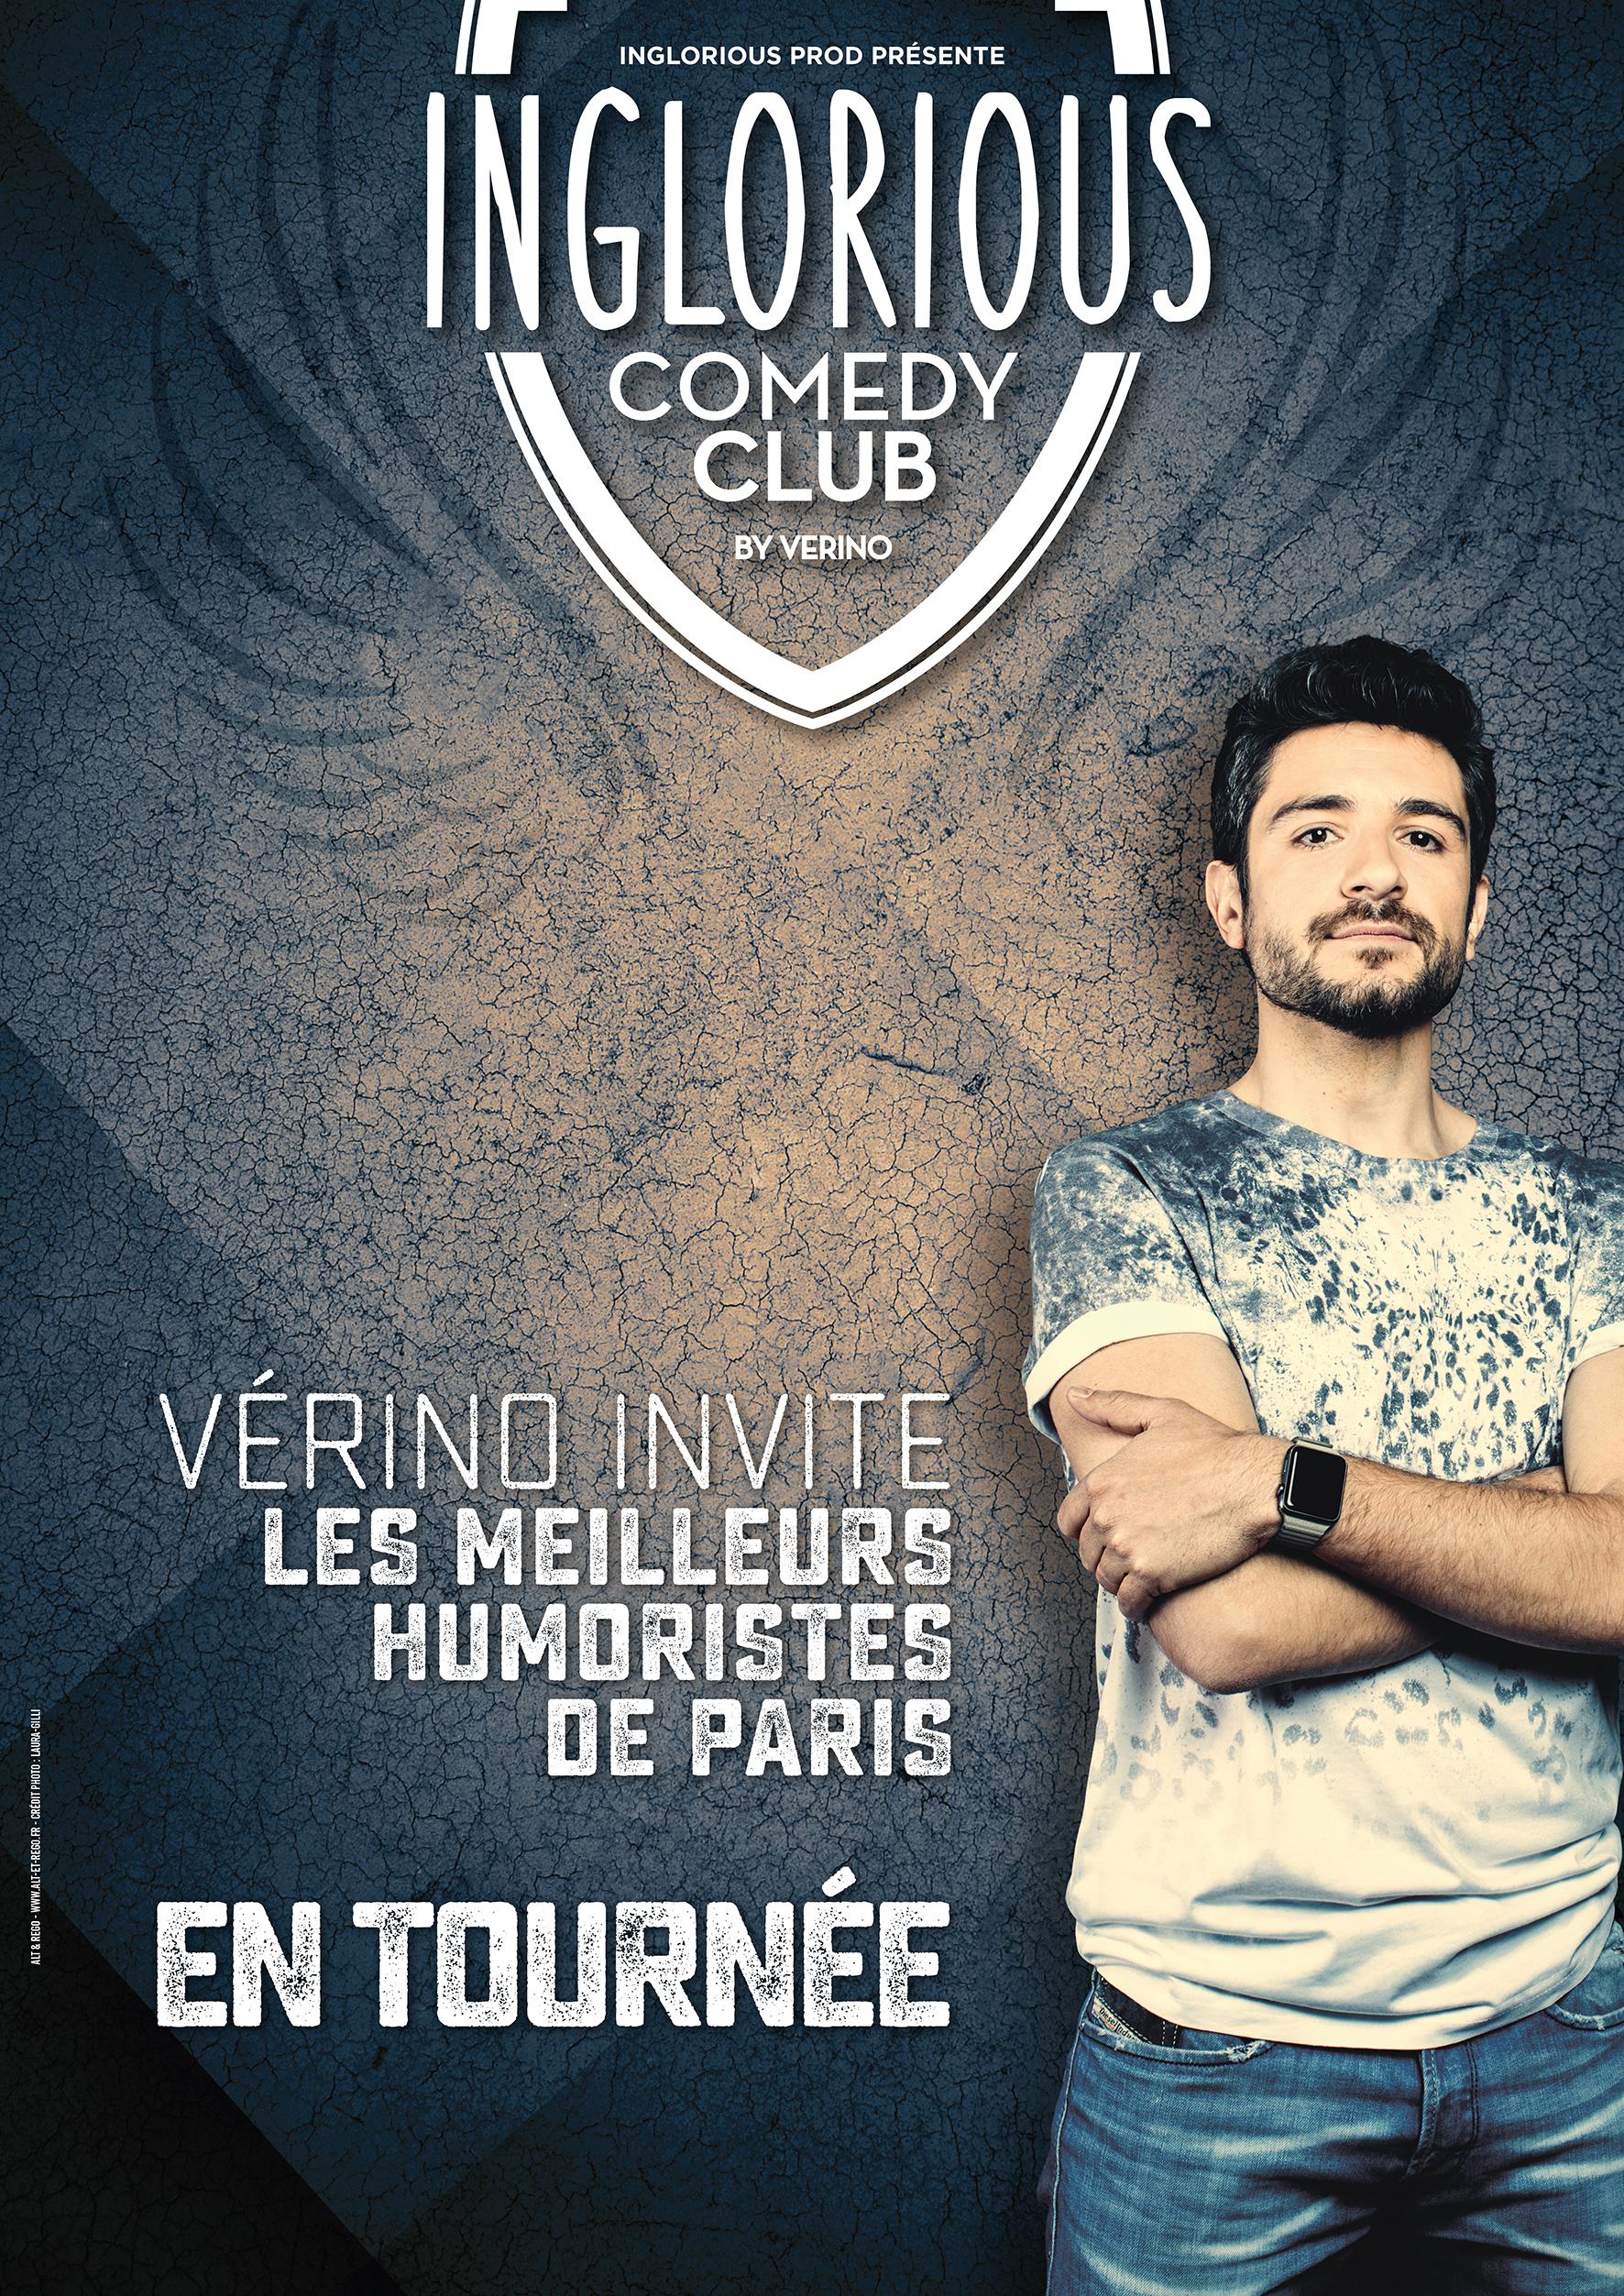 9ème Festival d'Humour : INGLORIOUS COMEDY CLUB